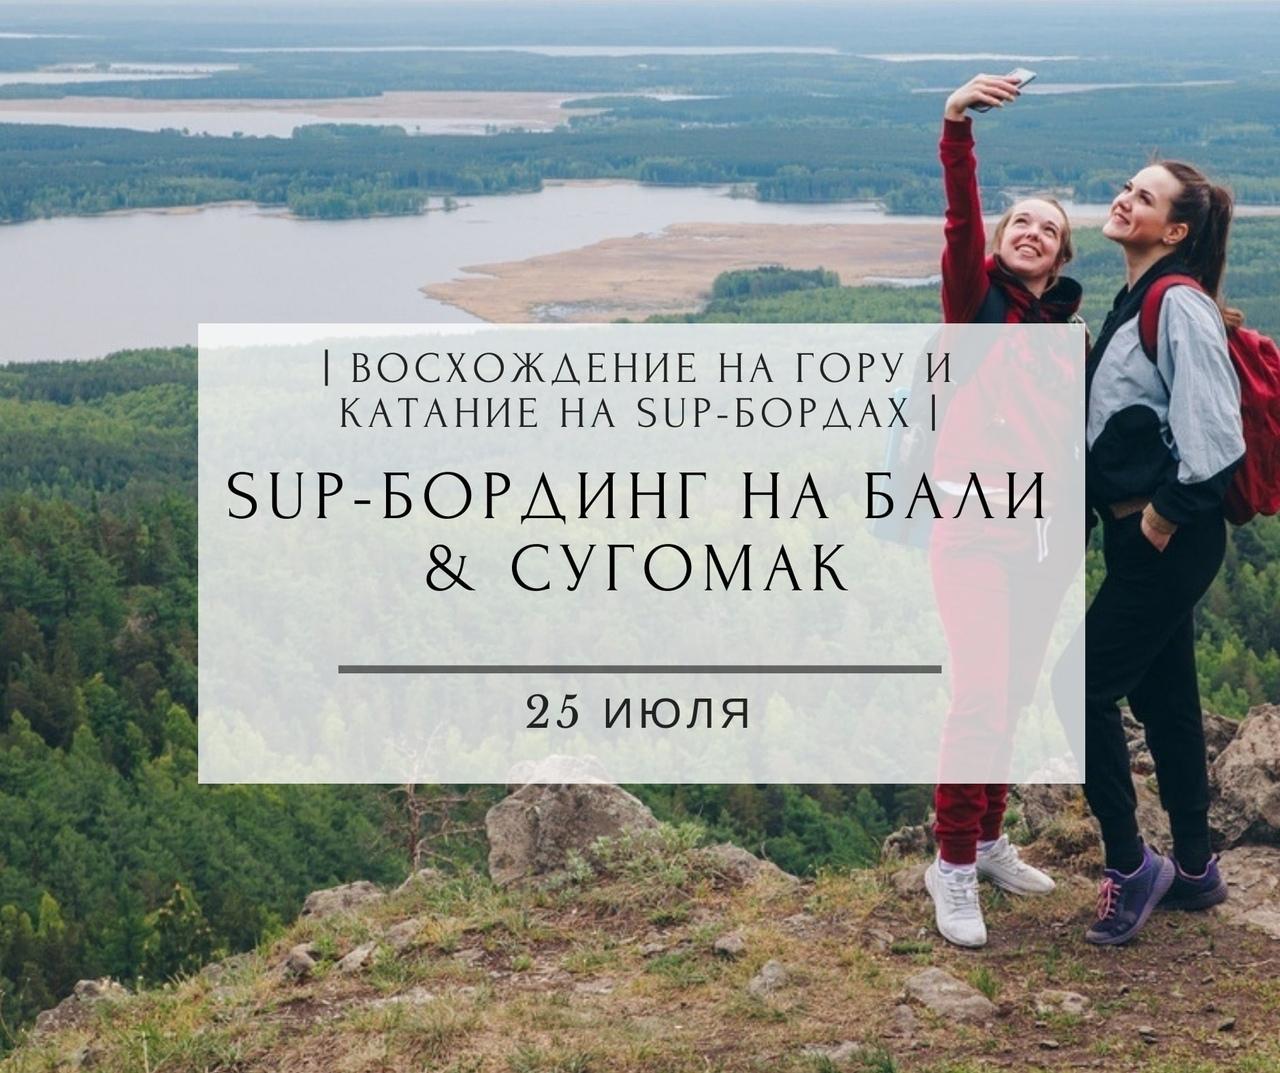 Афиша Тюмень SUP-БОРДИНГ НА БАЛИ & СУГОМАК / 25 ИЮЛЯ